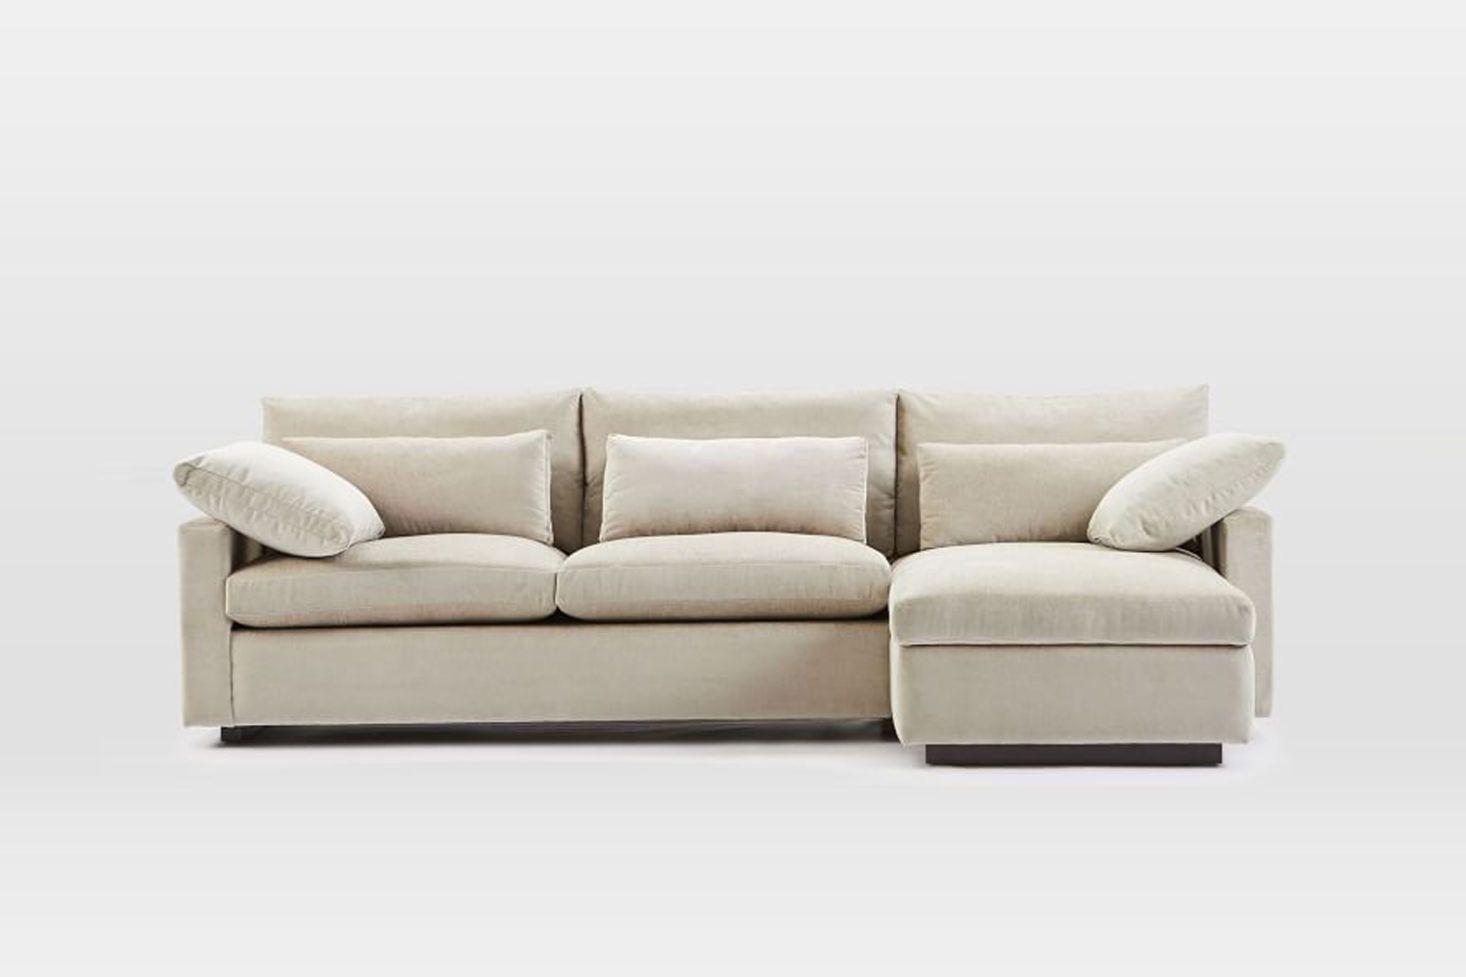 8 Favorites Surprisingly Attractive Sofas With Storage Sofa